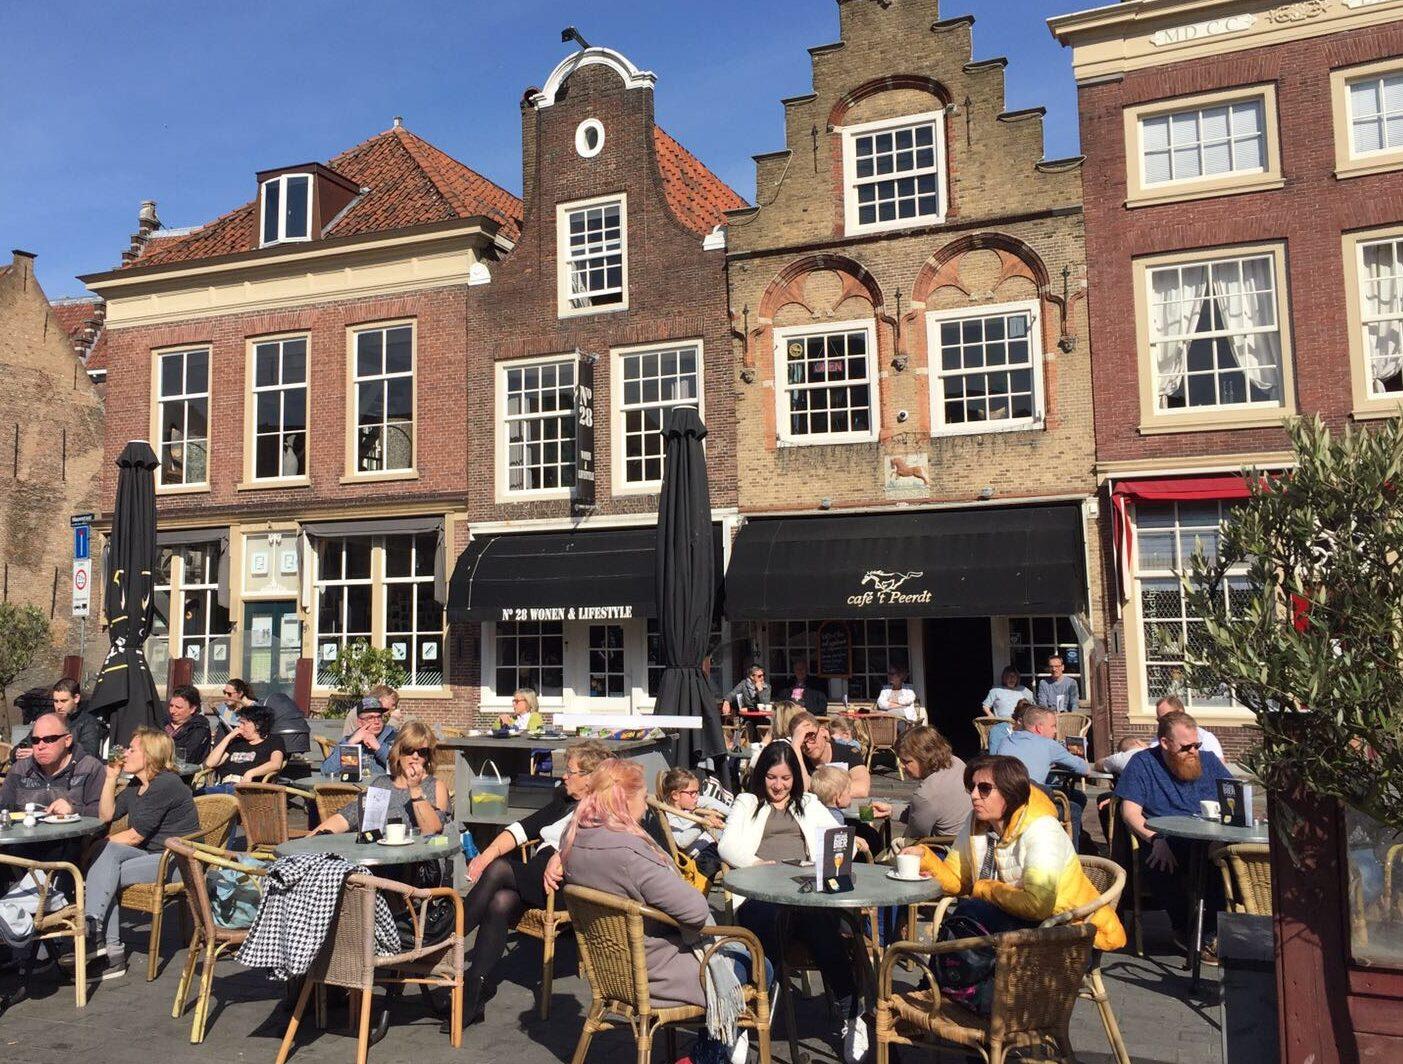 Cafe 't Peerdt Dordrecht Statenplein